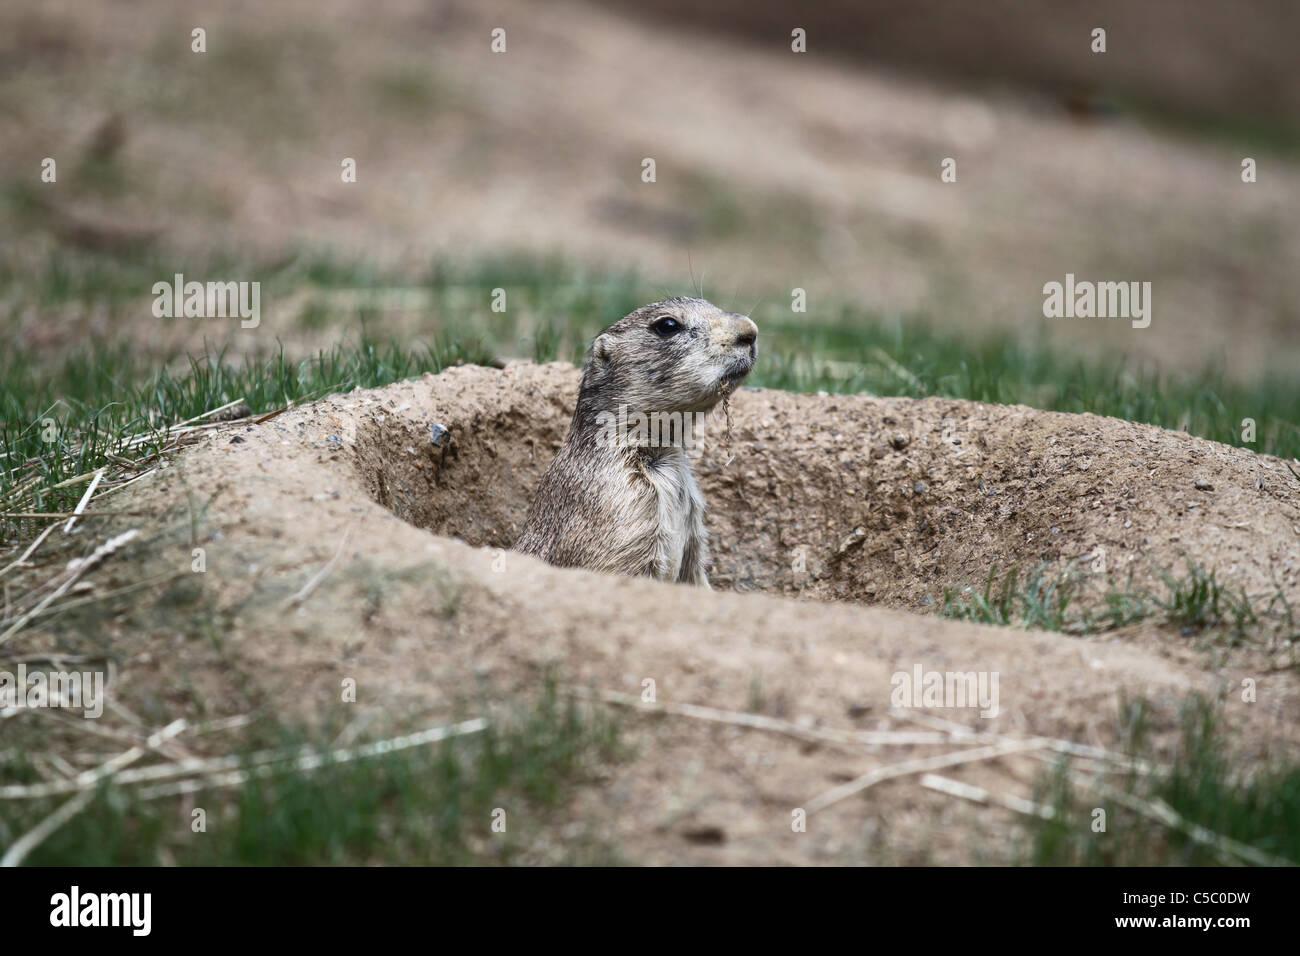 Prairie dog blurred outdoors background Stock Photo